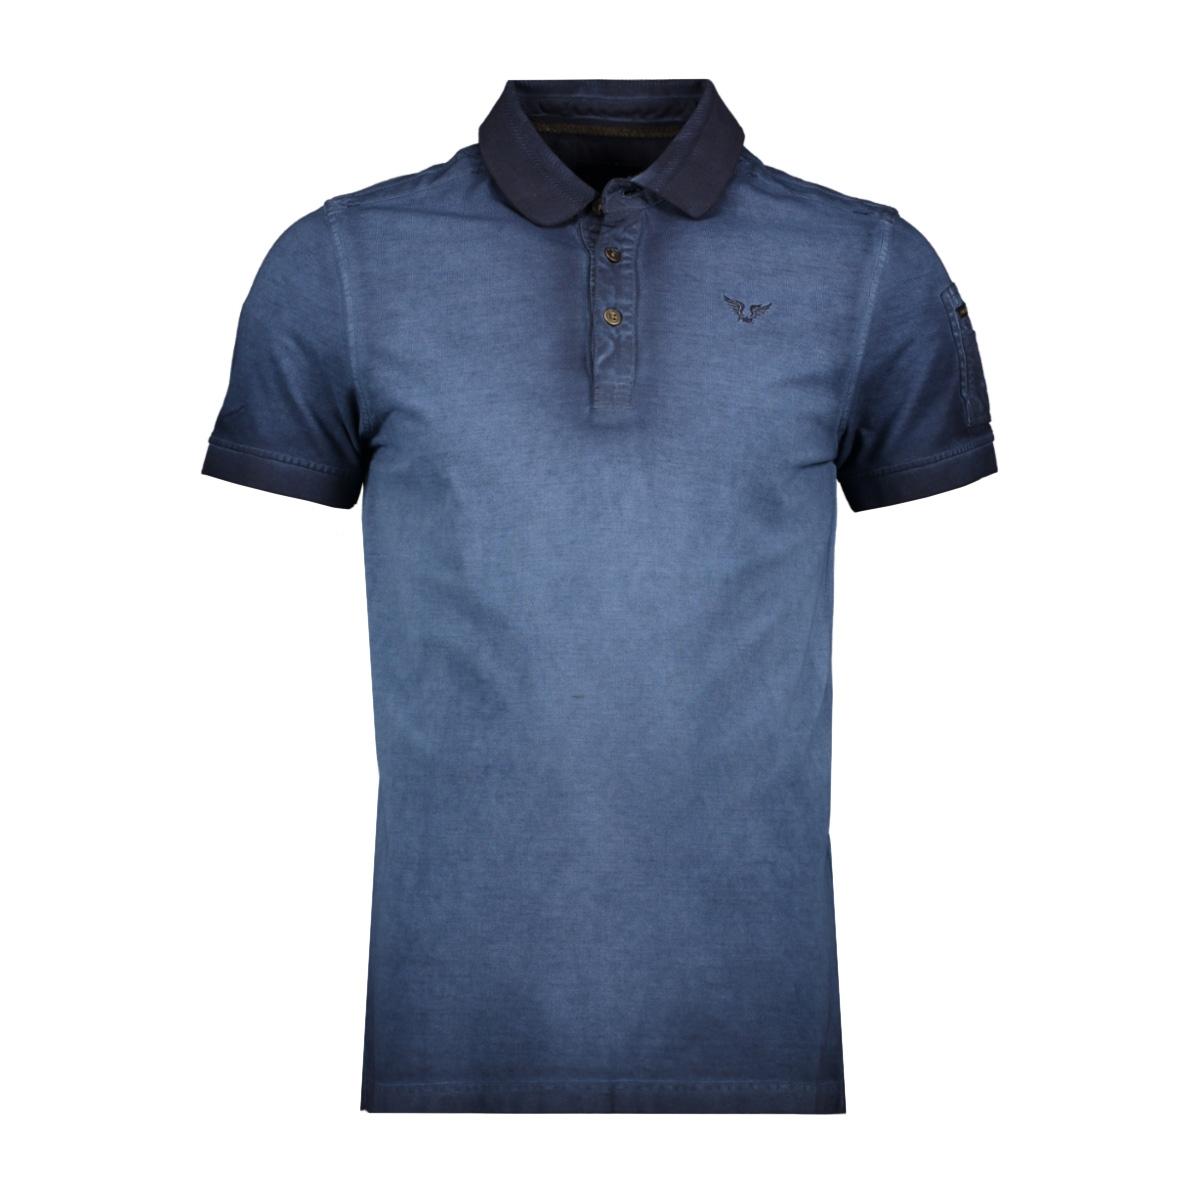 short sleeve polo ppss193851 pme legend polo 5287